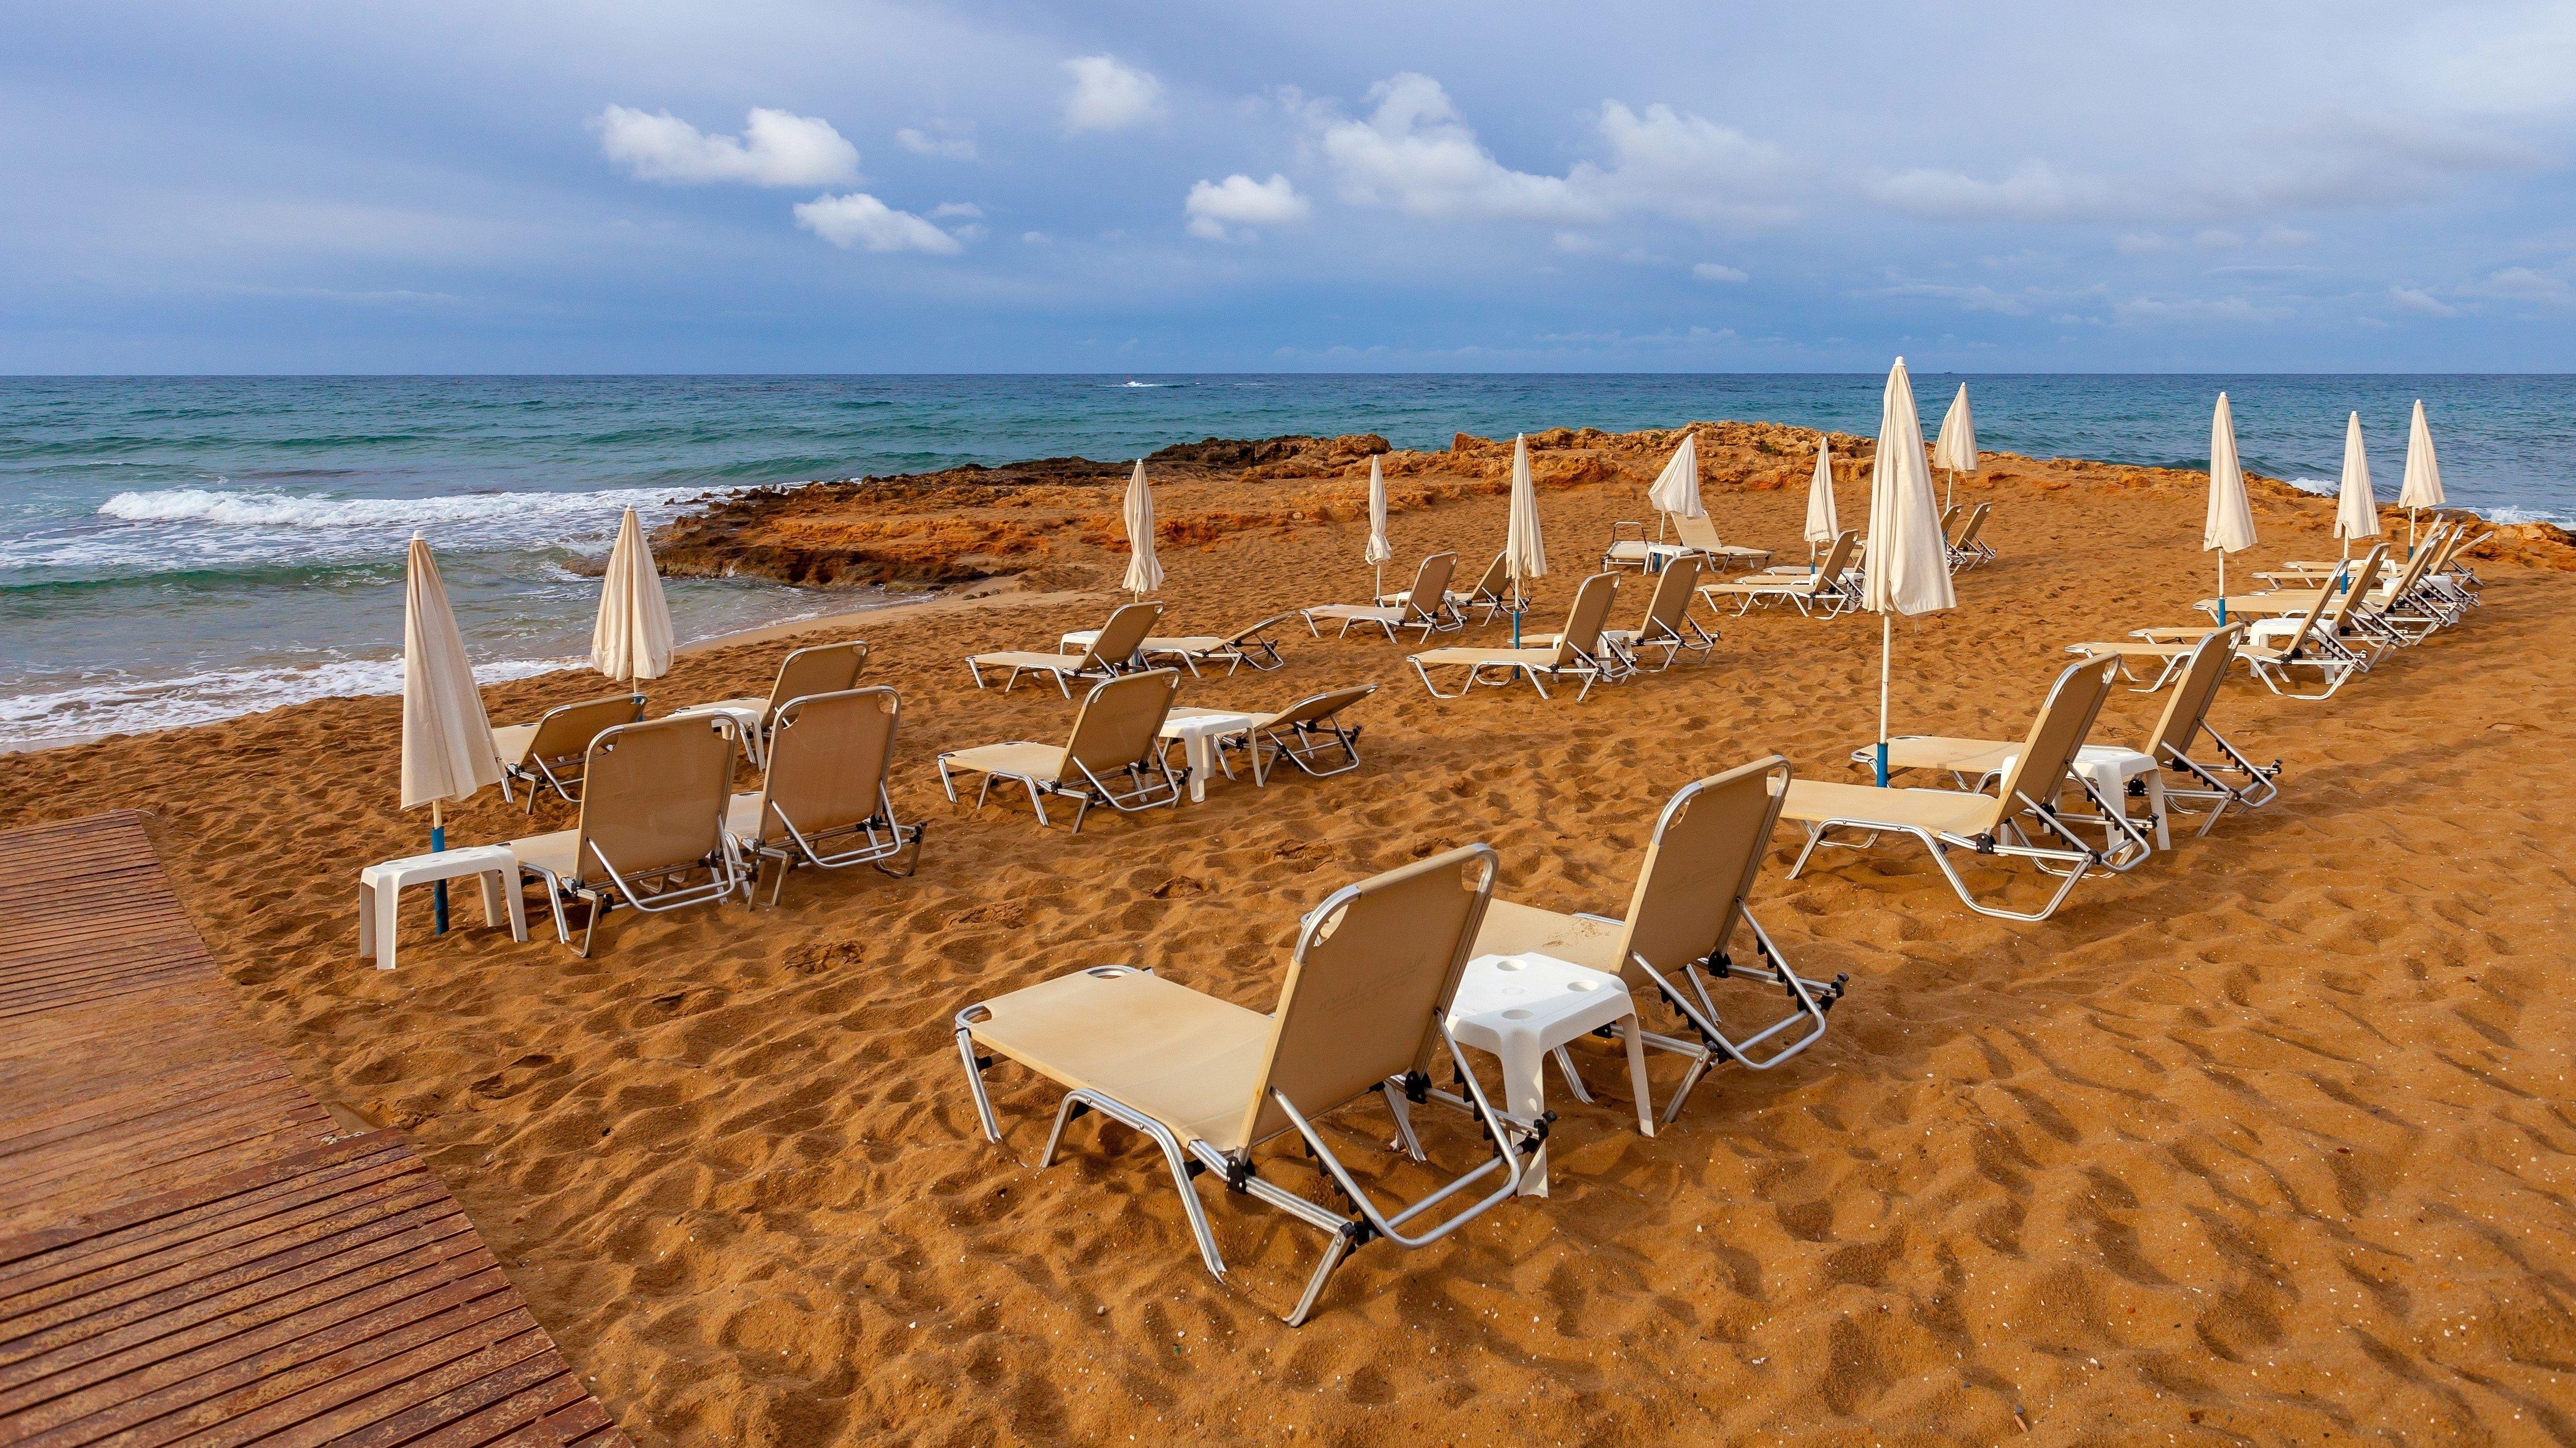 Leerer Strand auf Kreta